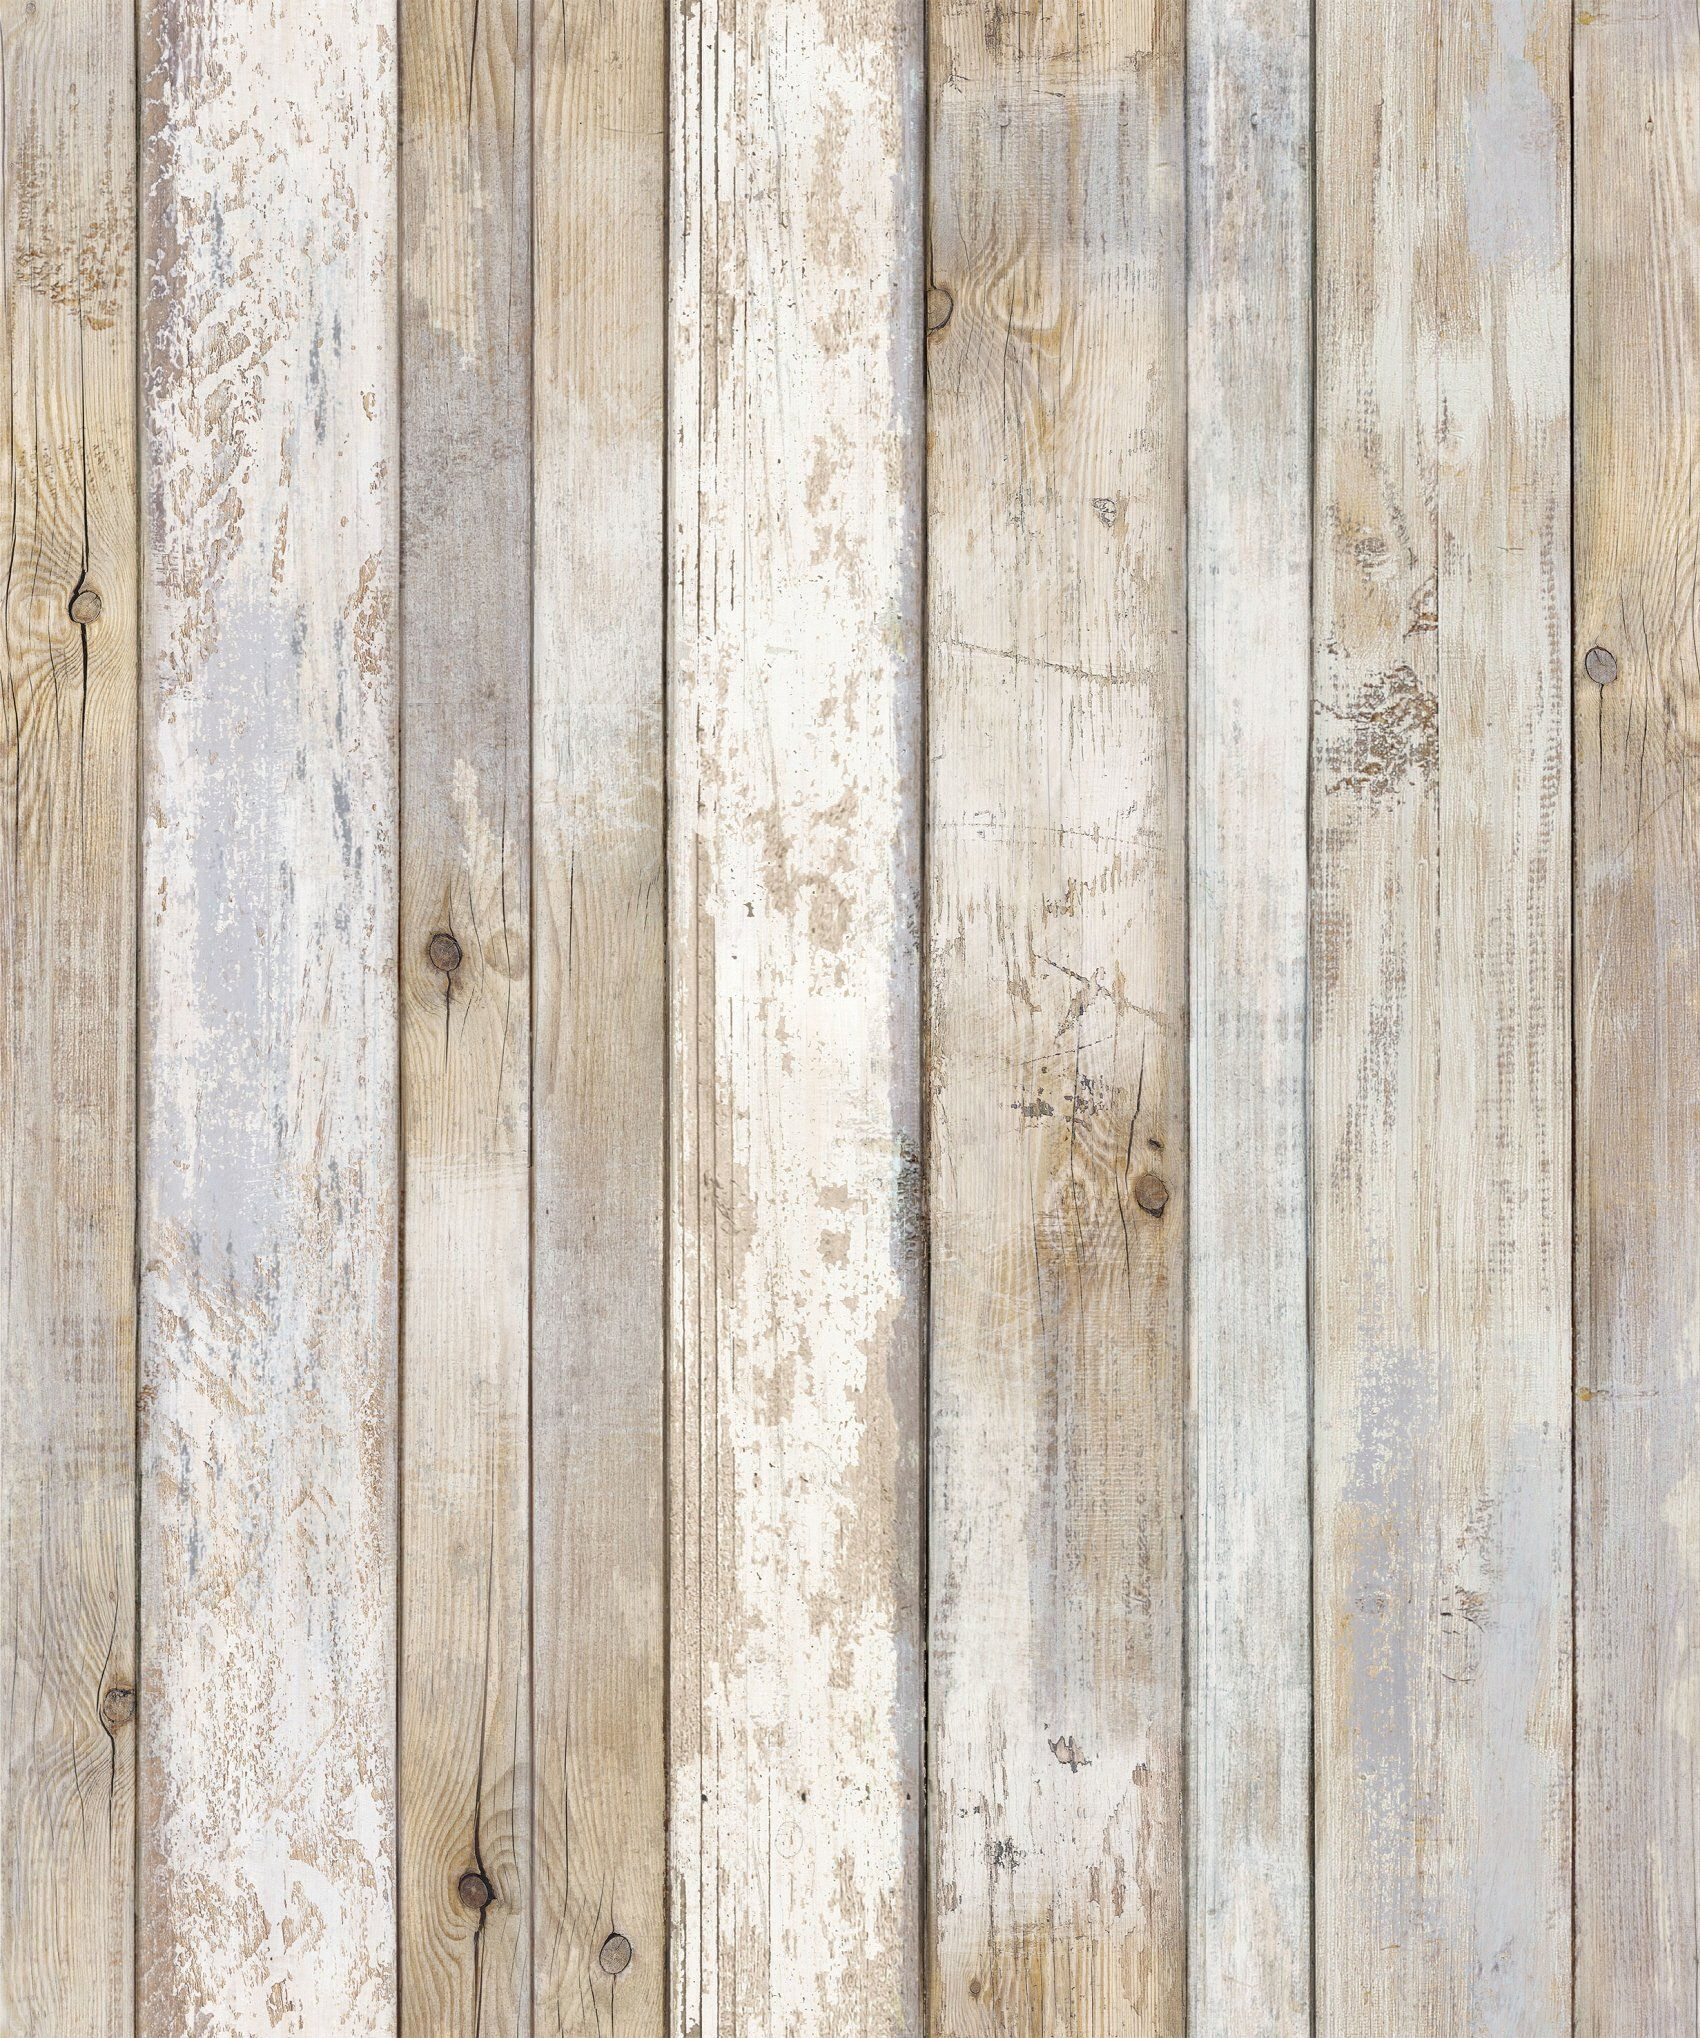 Reclaimed Wood Distressed Wood Panel Wood Grain Self adhesive Peel